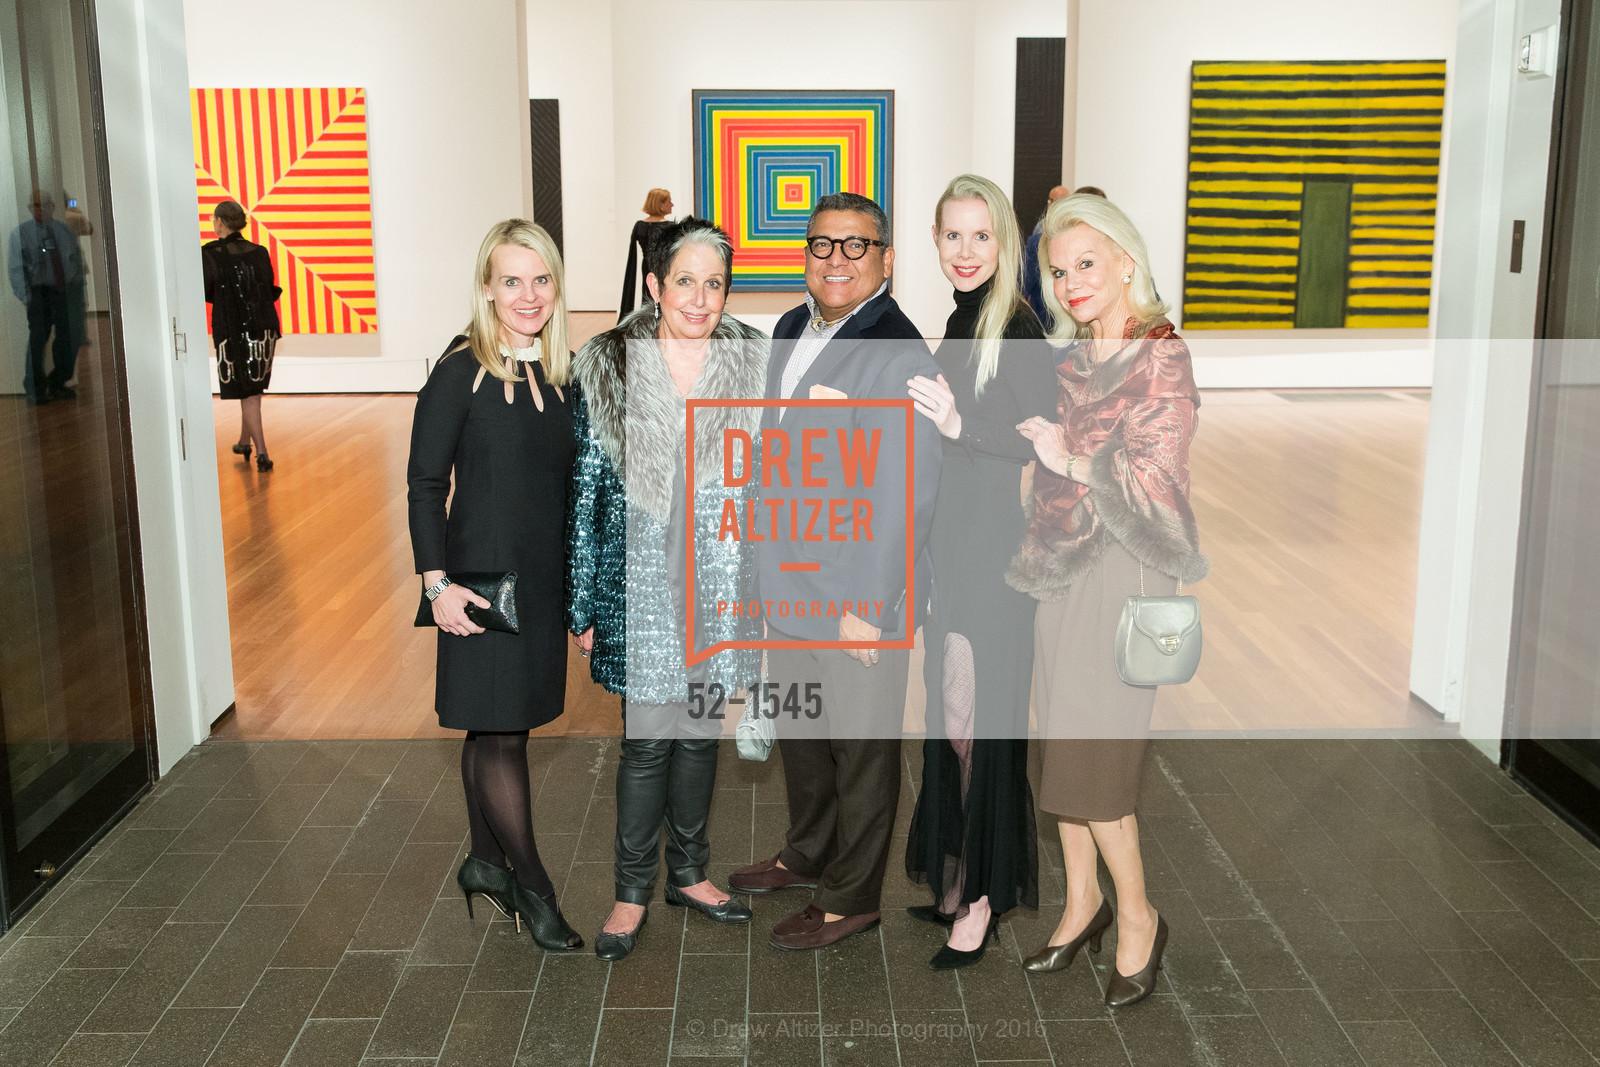 Jane Mudge, Karen Kubin, Riccardo Benavides, Shannon Cronan, Sandra Farris, Photo #52-1545